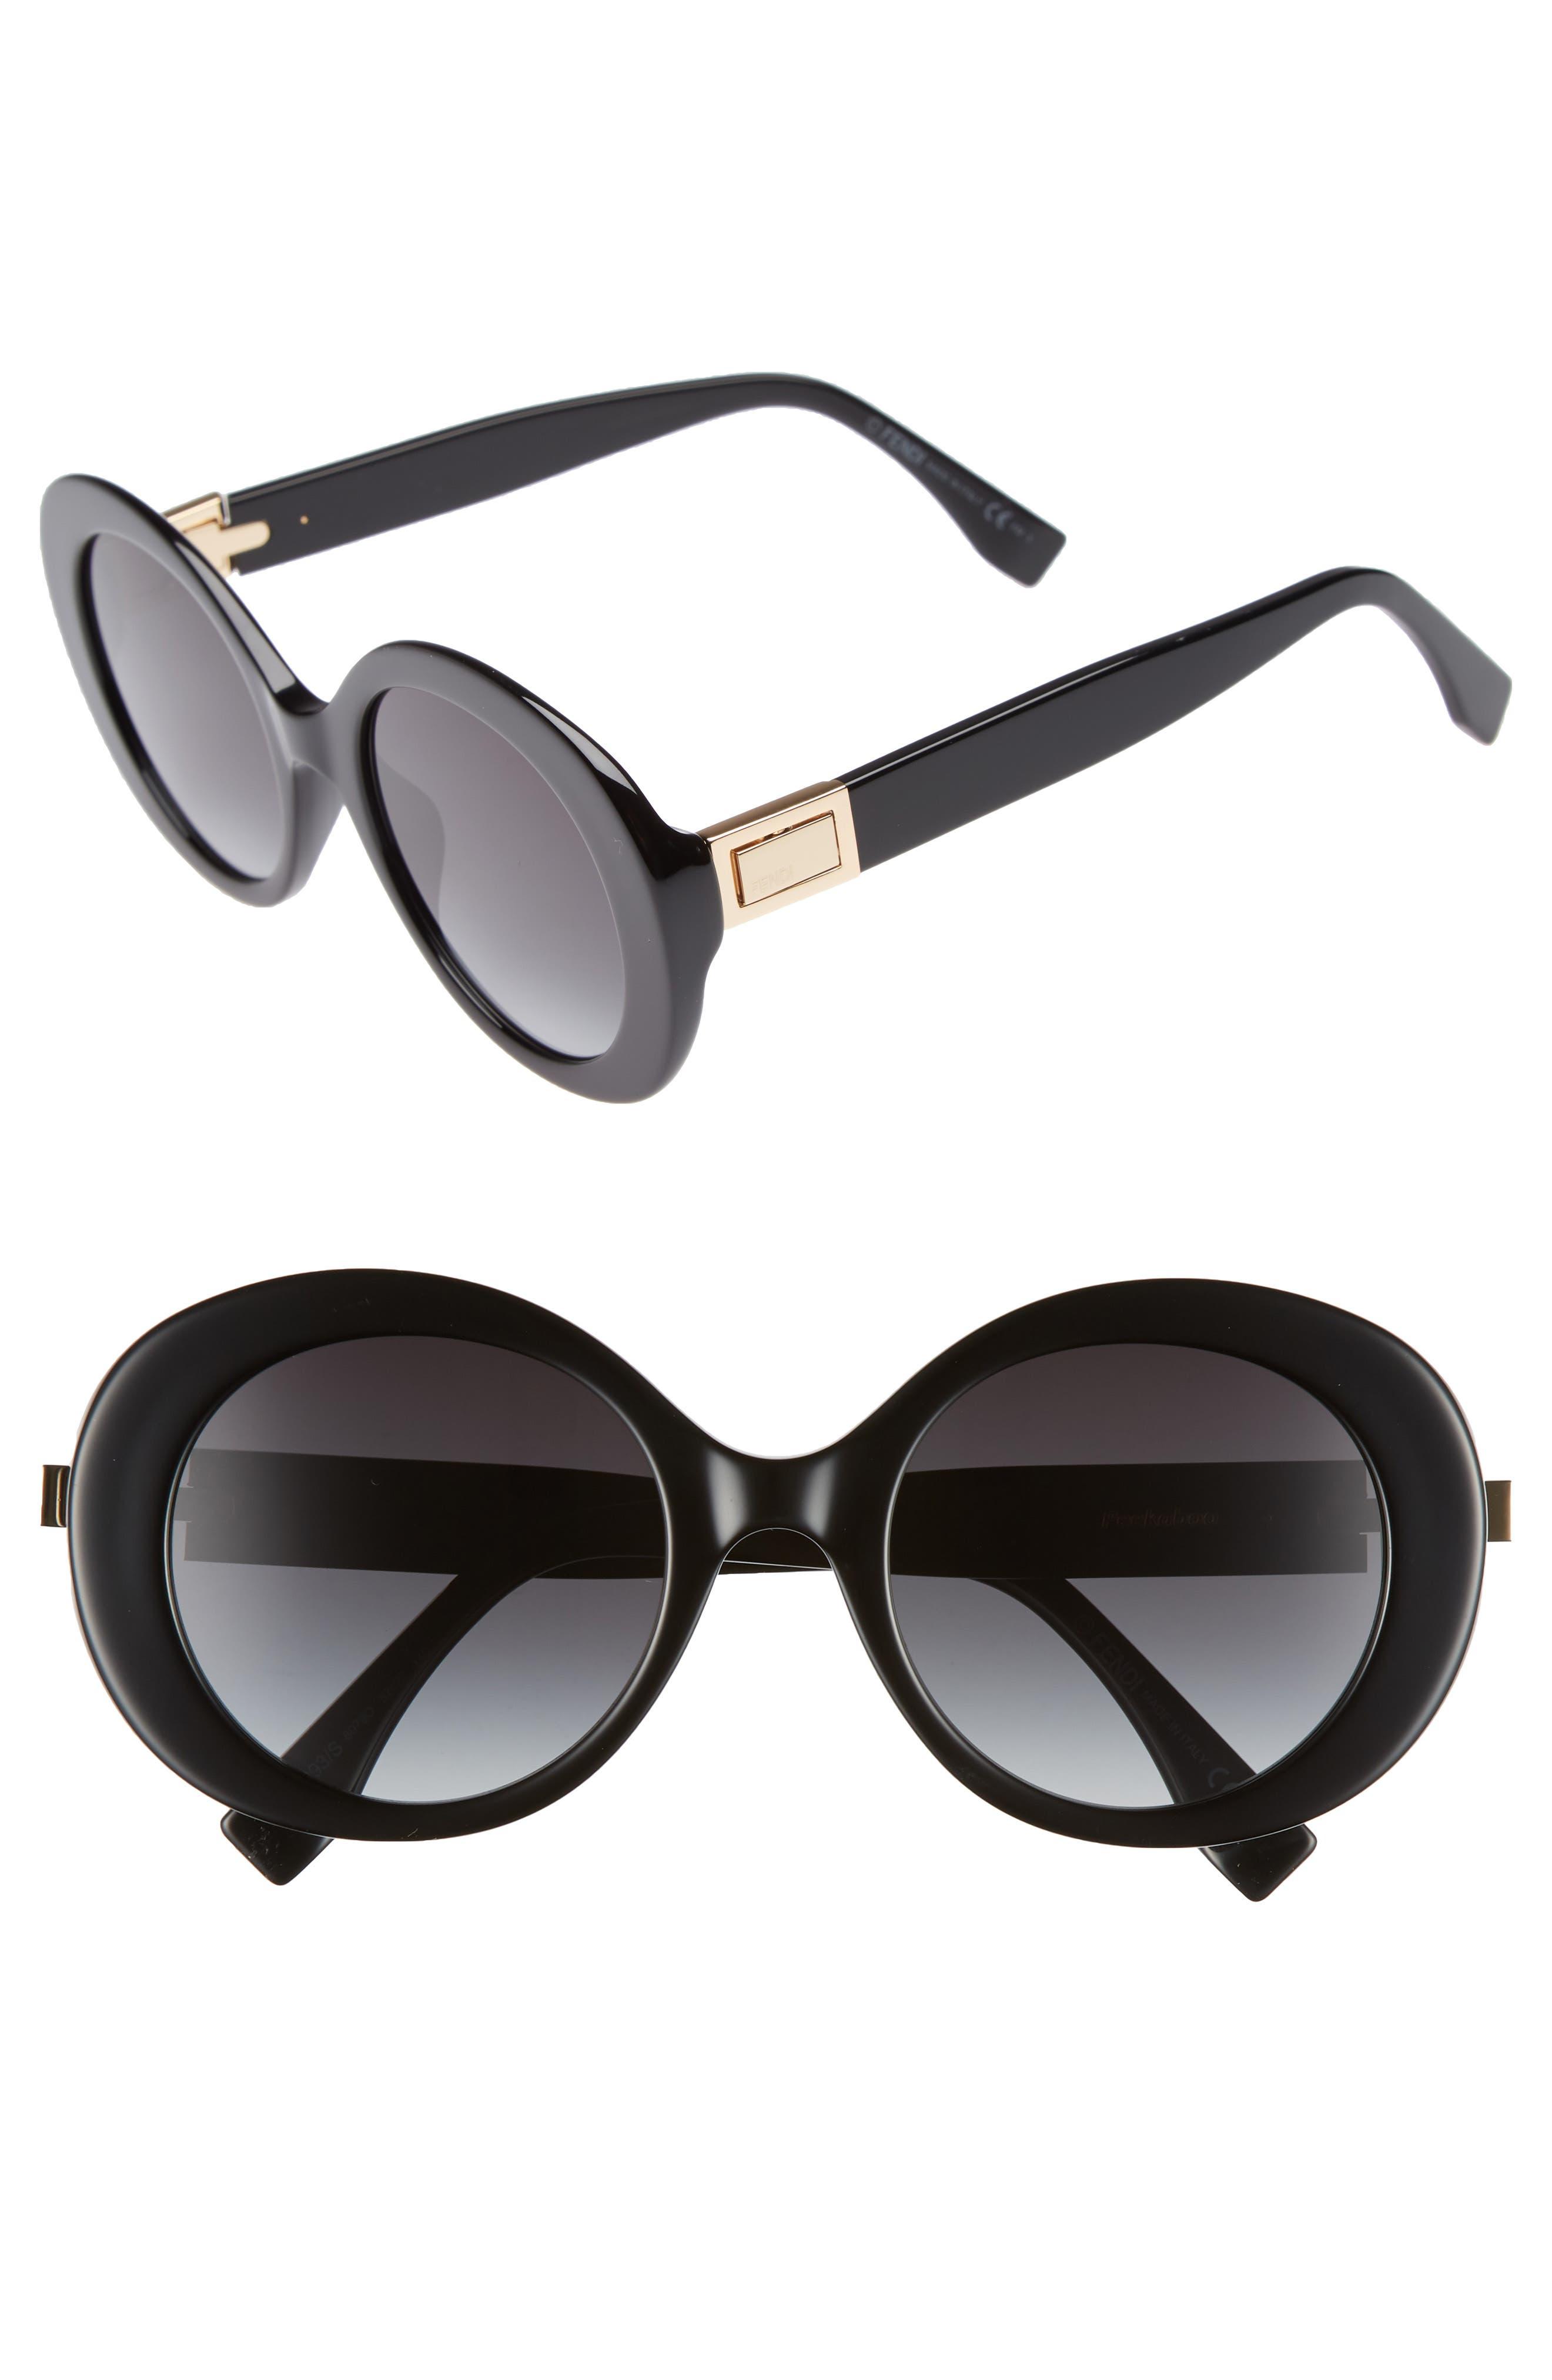 52mm Round Sunglasses,                             Main thumbnail 1, color,                             Black